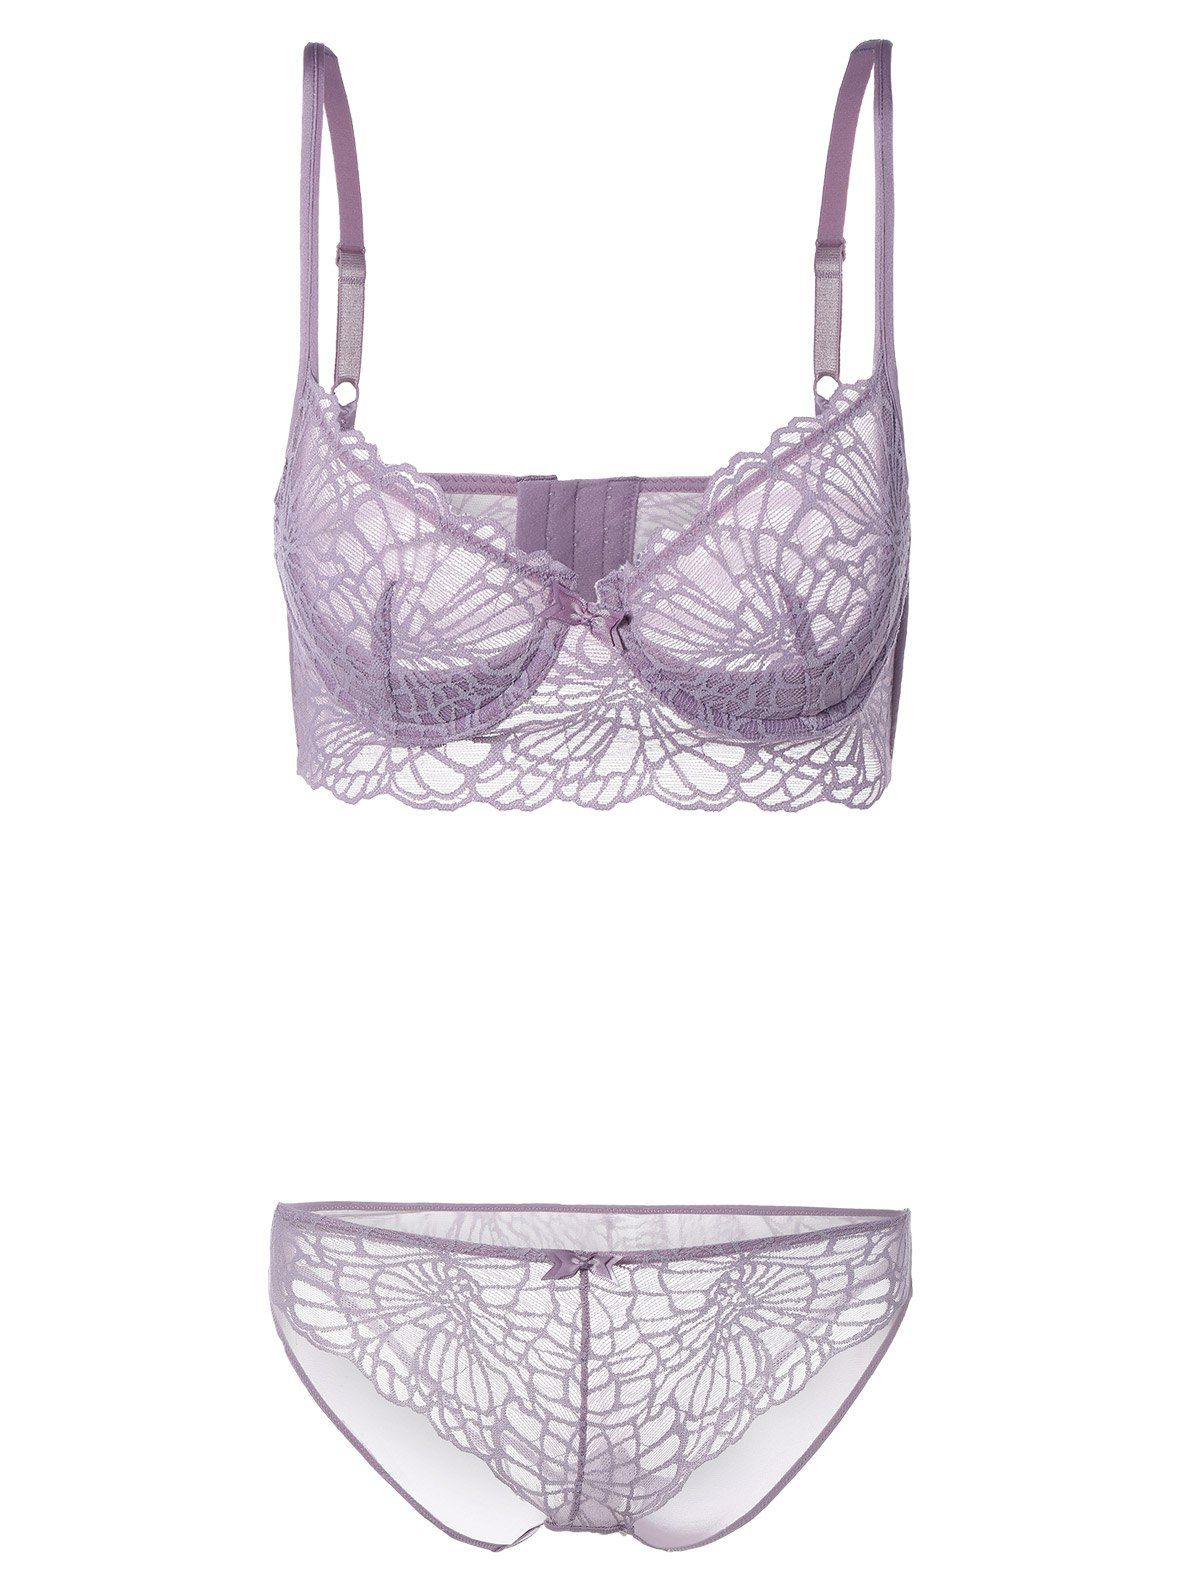 Adorable wife sheer purple bra and panties